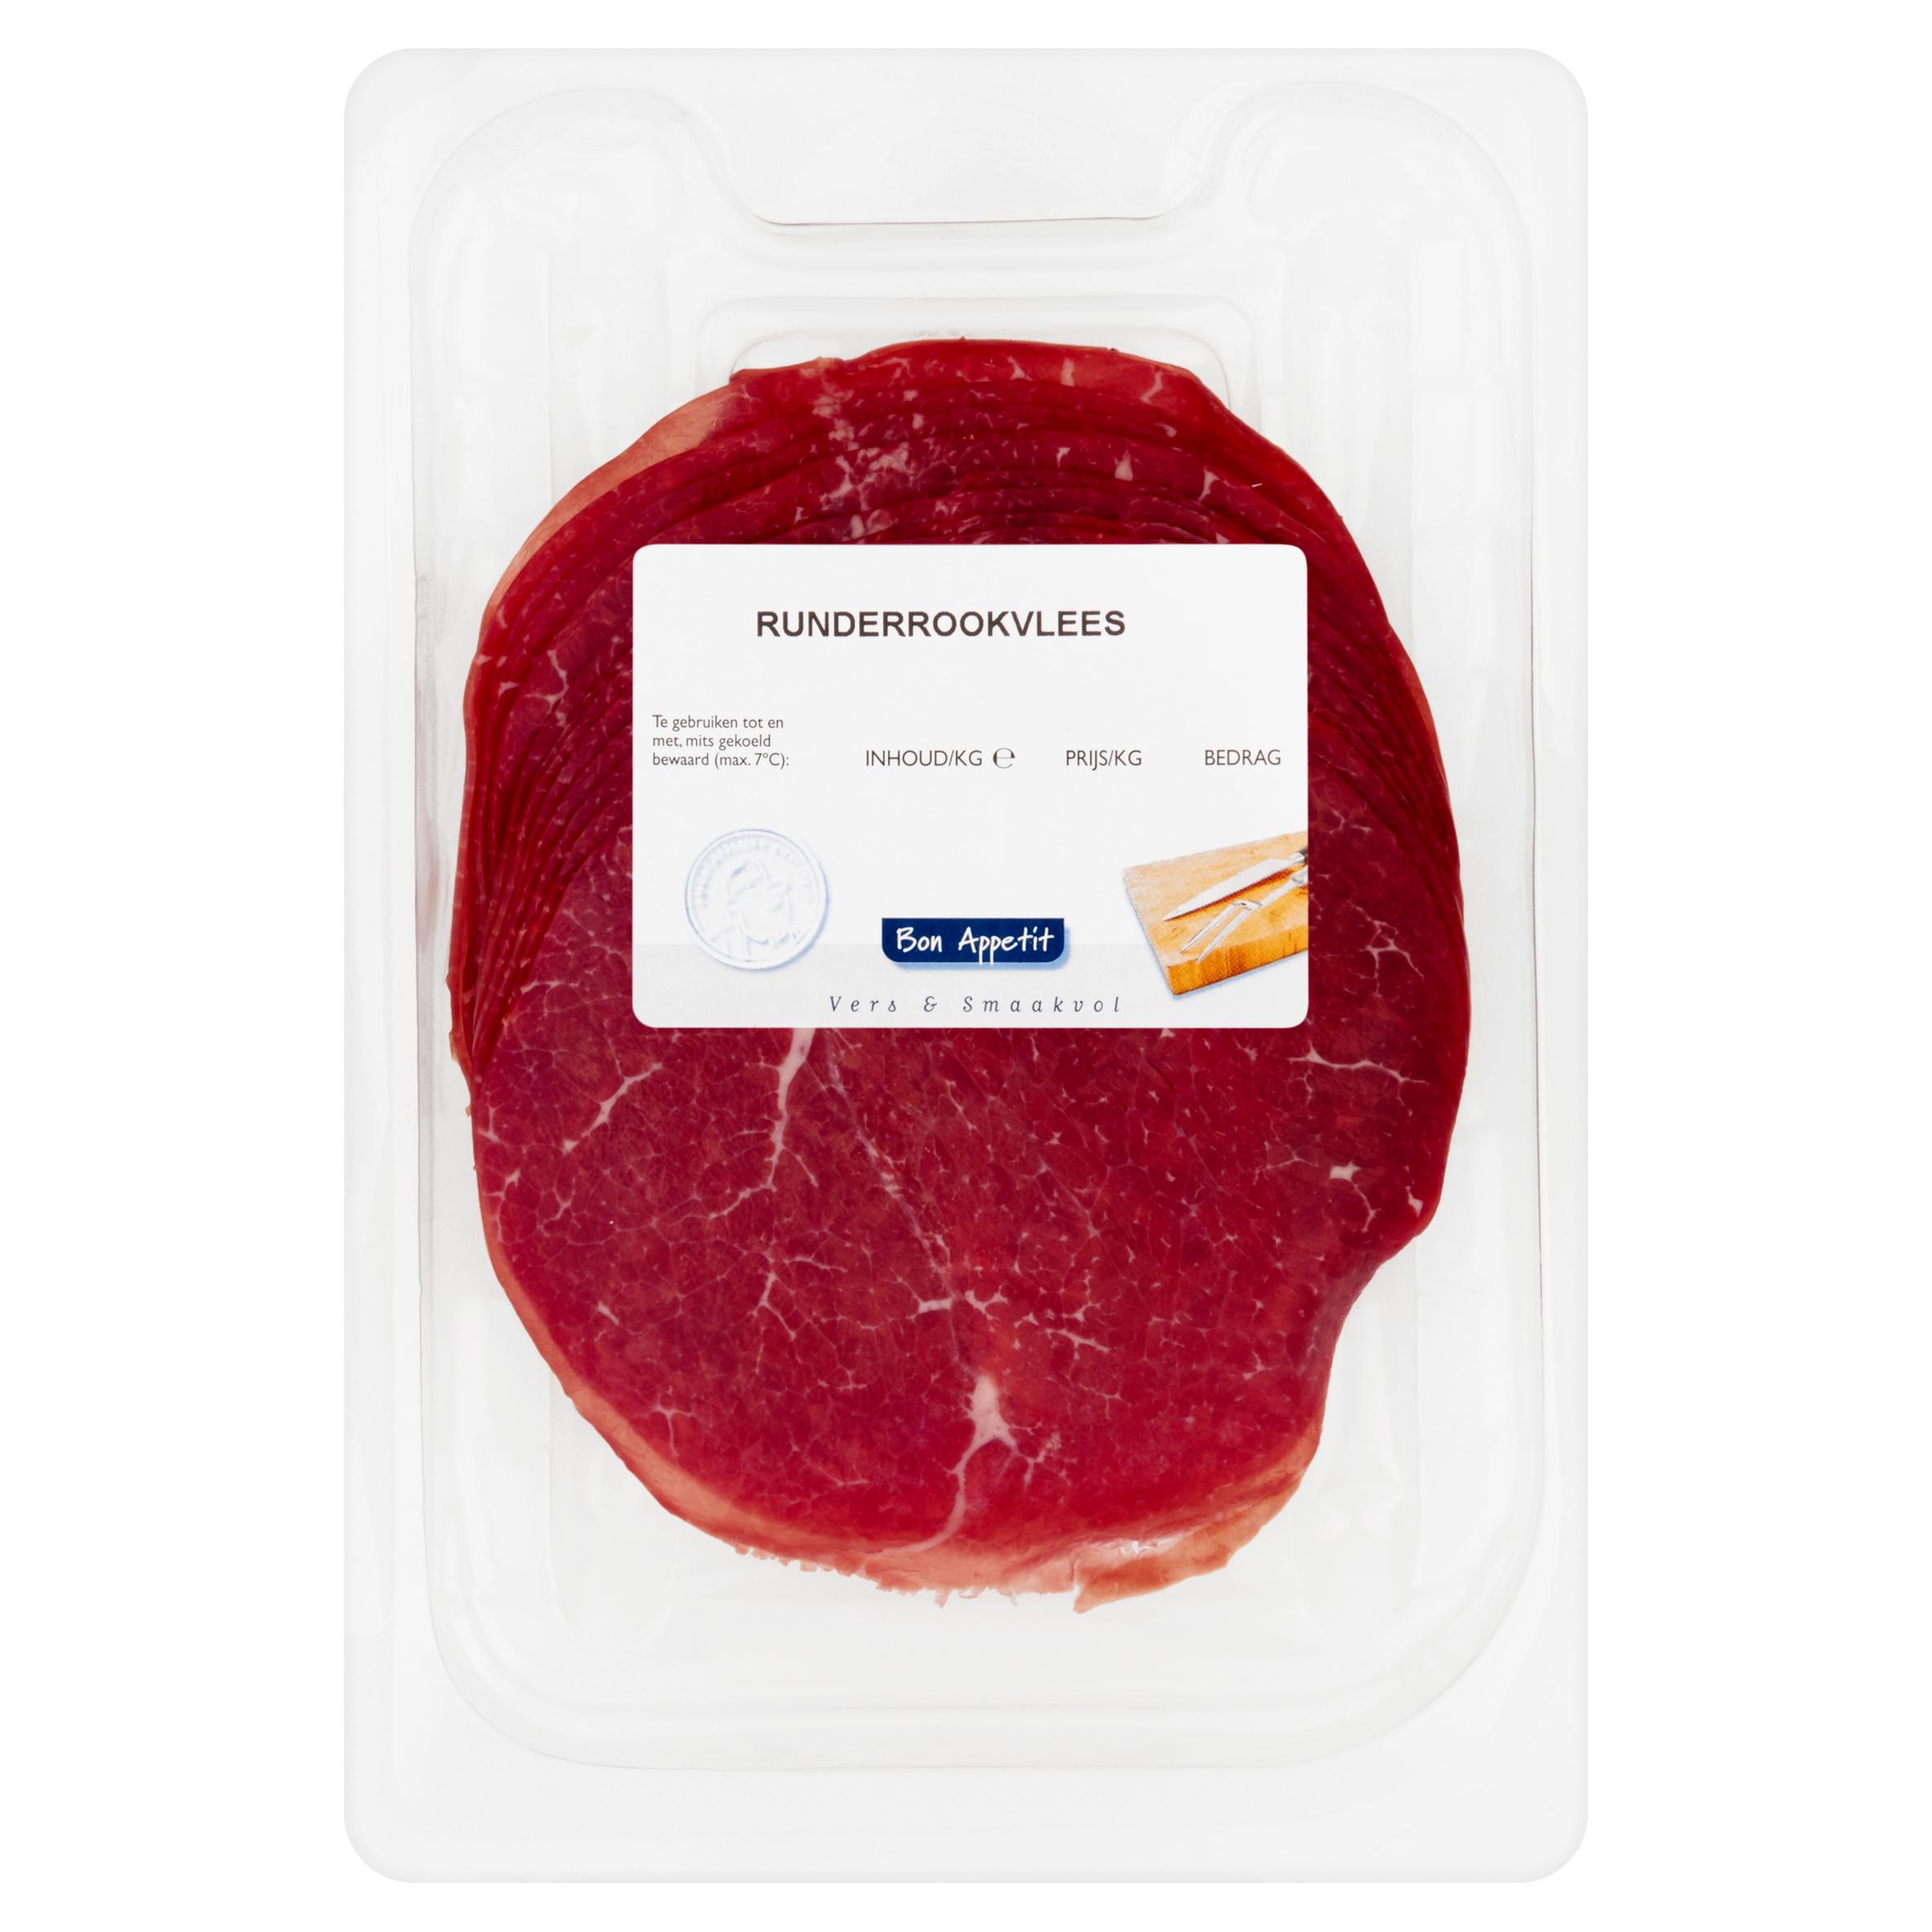 Bon Appetit Runderrookvlees 0,100 kg